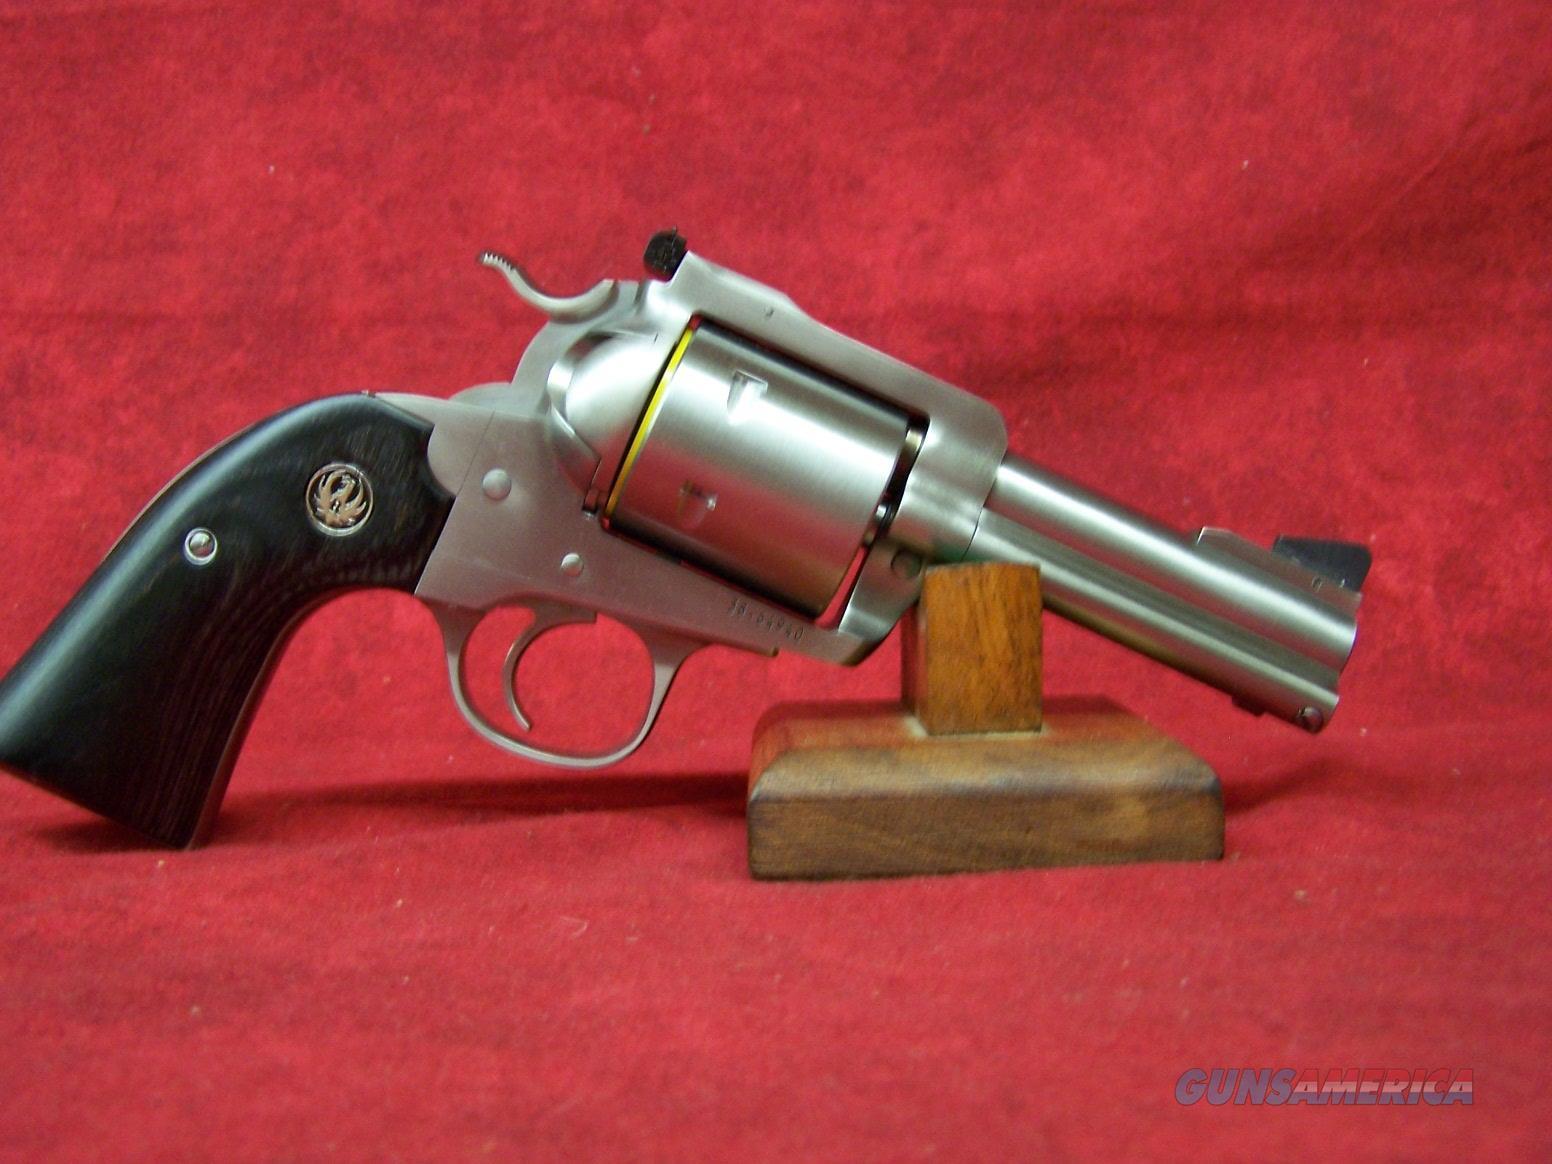 "Ruger Super Blackhawk Bisley 45 ACP | 45 COLT 3.75""  SS Barrel (00475)  Guns > Pistols > Ruger Single Action Revolvers > Blackhawk Type"